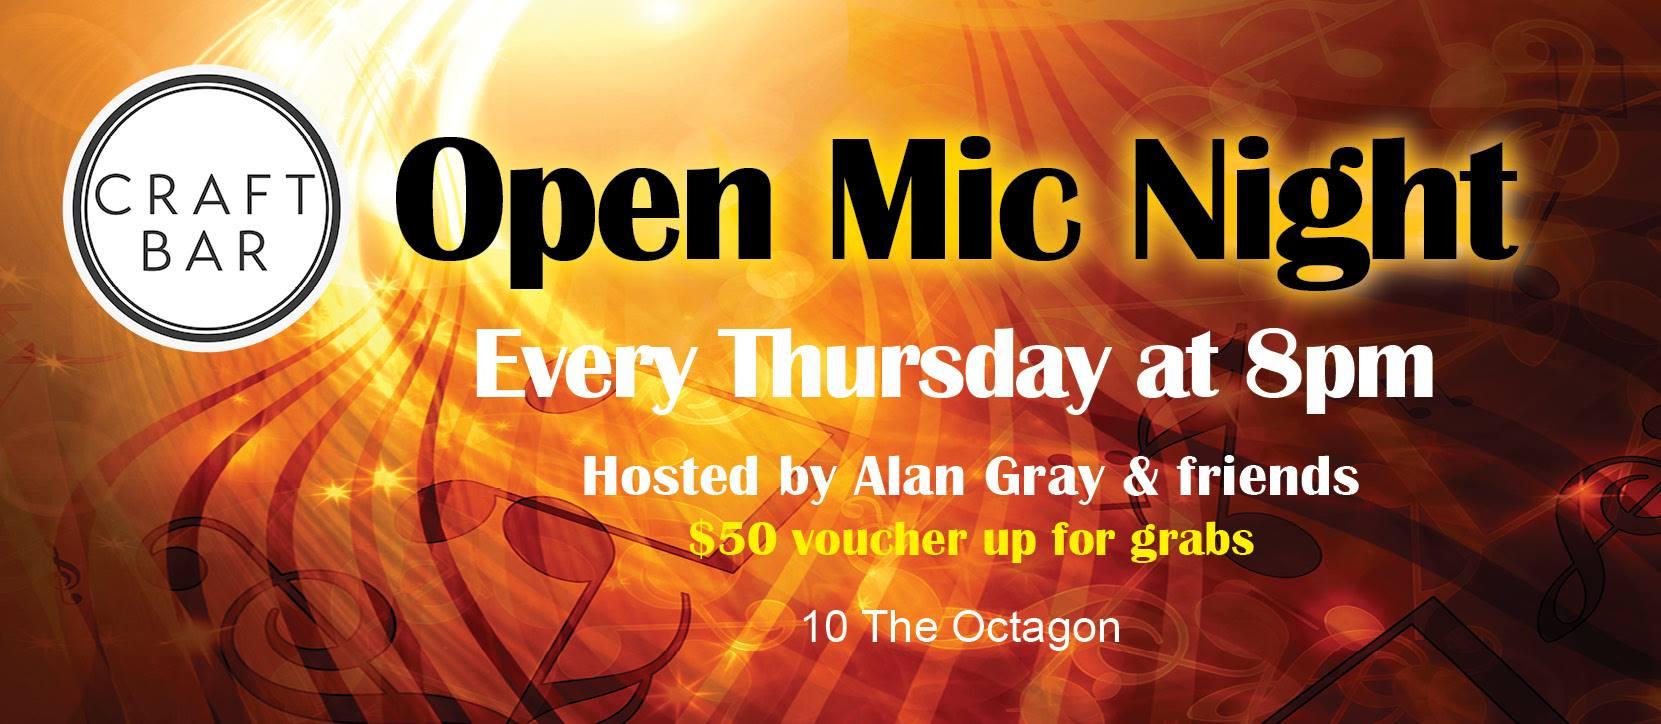 Open Mic Night At Craft Bar